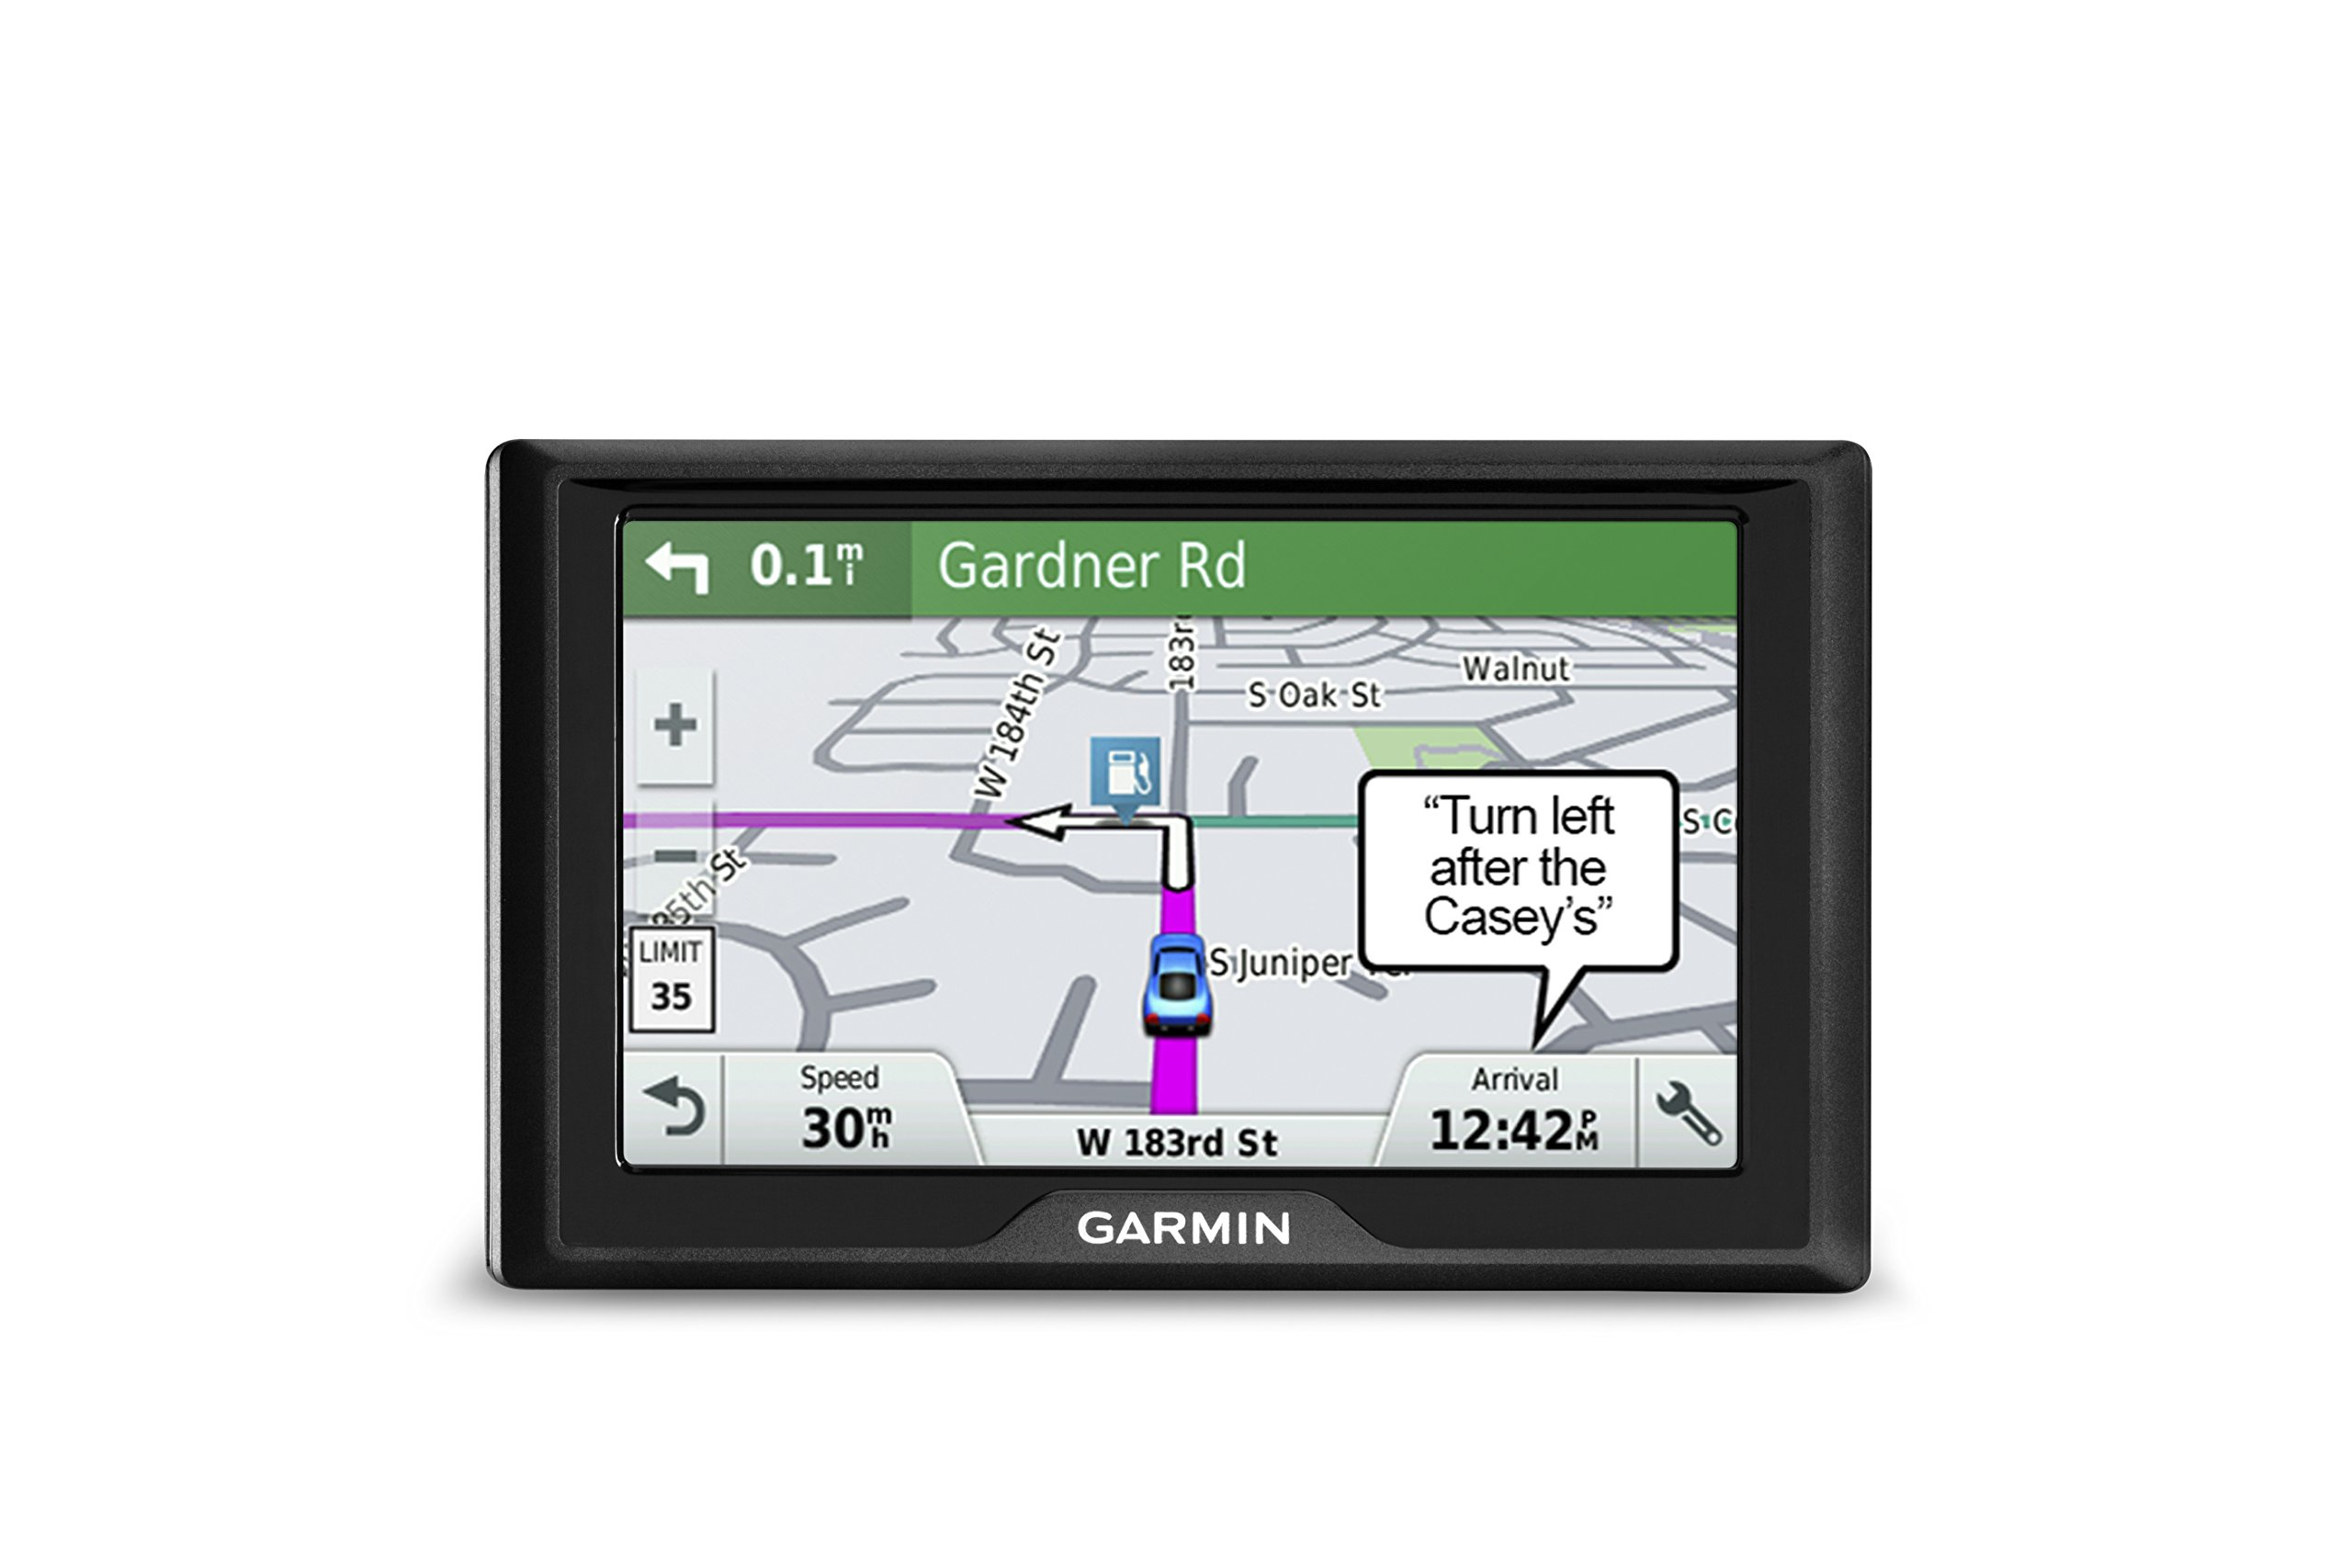 galleon garmin drive 50 usa lm gps navigator system with lifetime maps spoken turn by turn. Black Bedroom Furniture Sets. Home Design Ideas